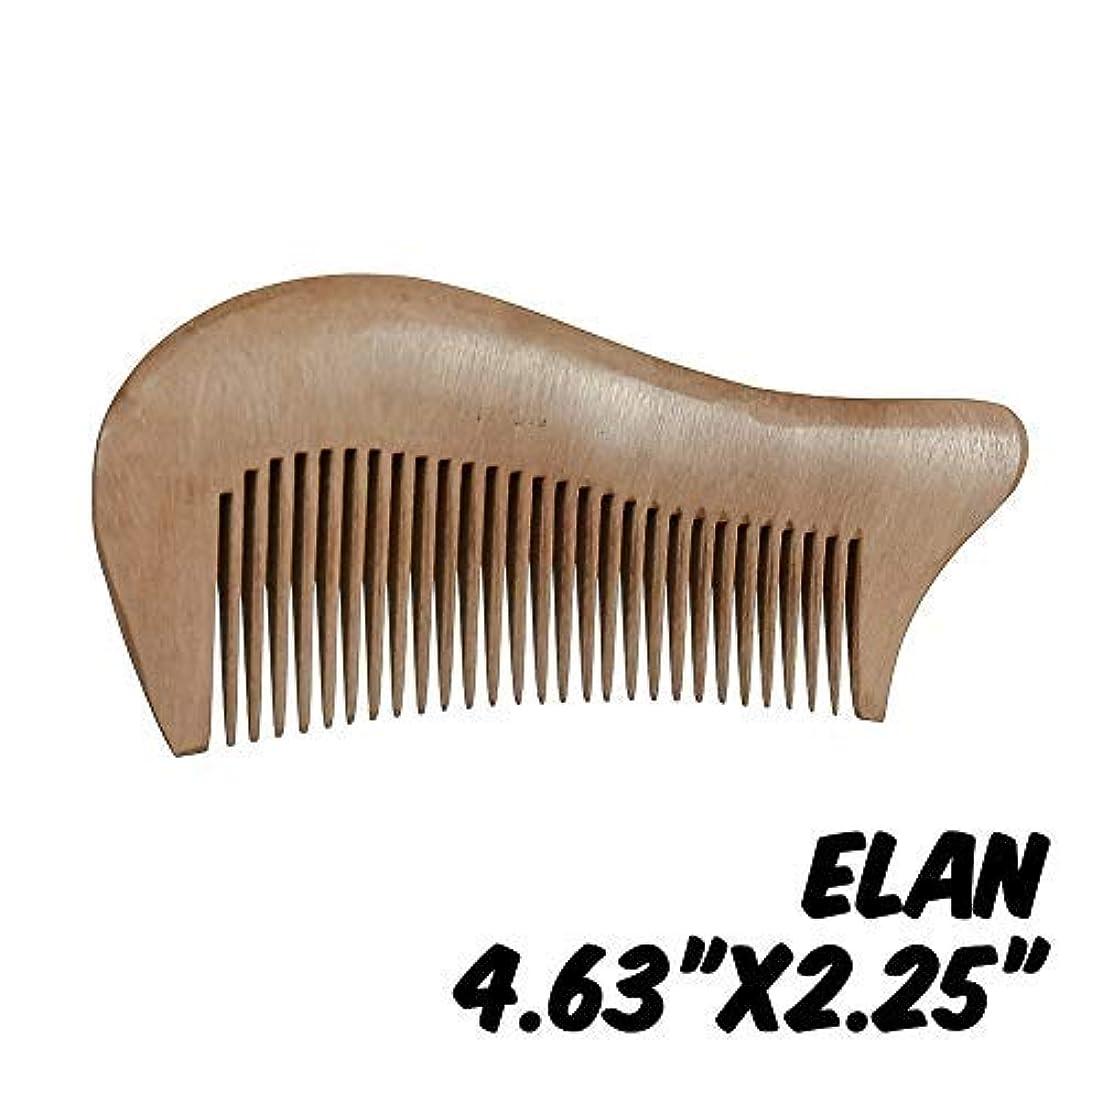 Markin Arts Elan Series Handmade Natural Organic Indian Lilac Wood Anti-Static Hypoallergenic Pocket Handle Dry...